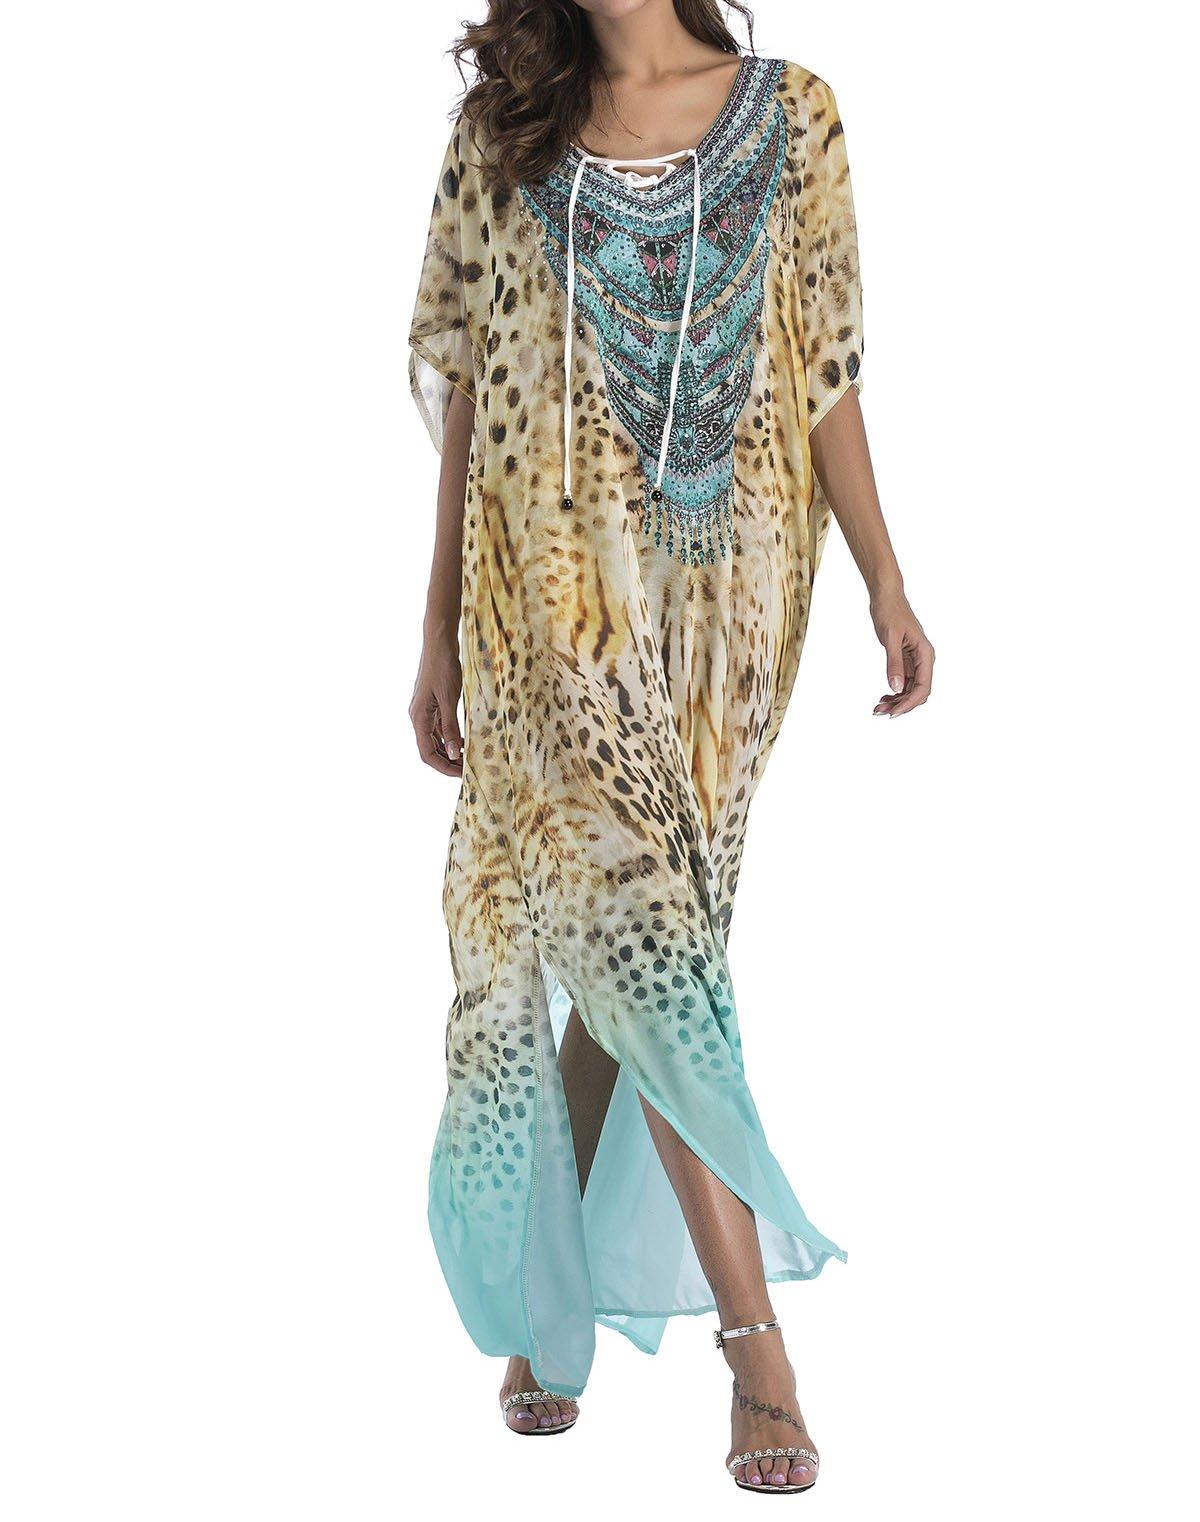 Pamor Flowy Rhinestone Long Caftan Beach Maxi Dress Sexy Cover Up For Women (style8)